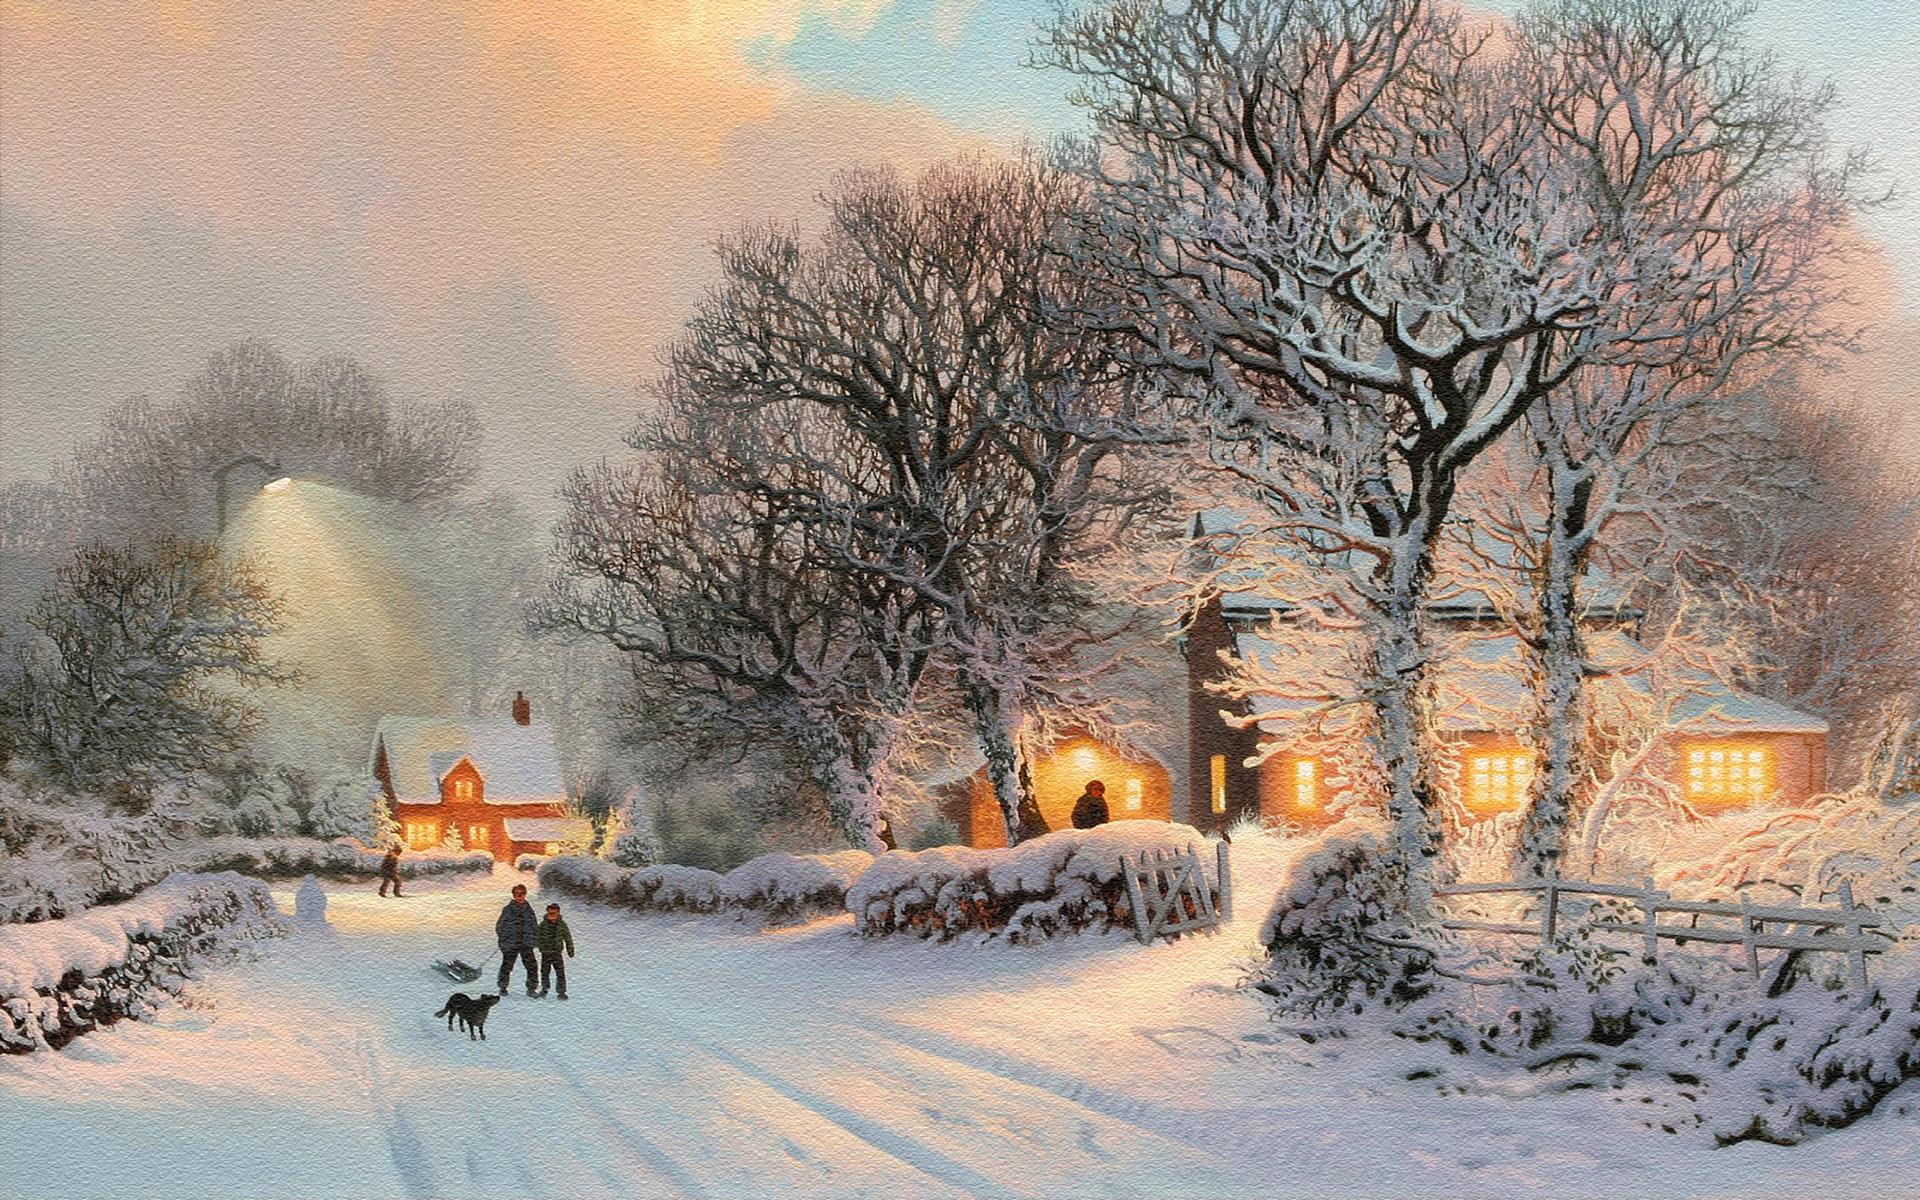 winter scene cool one best winter wallpapers best winter wallpapers 1920x1200